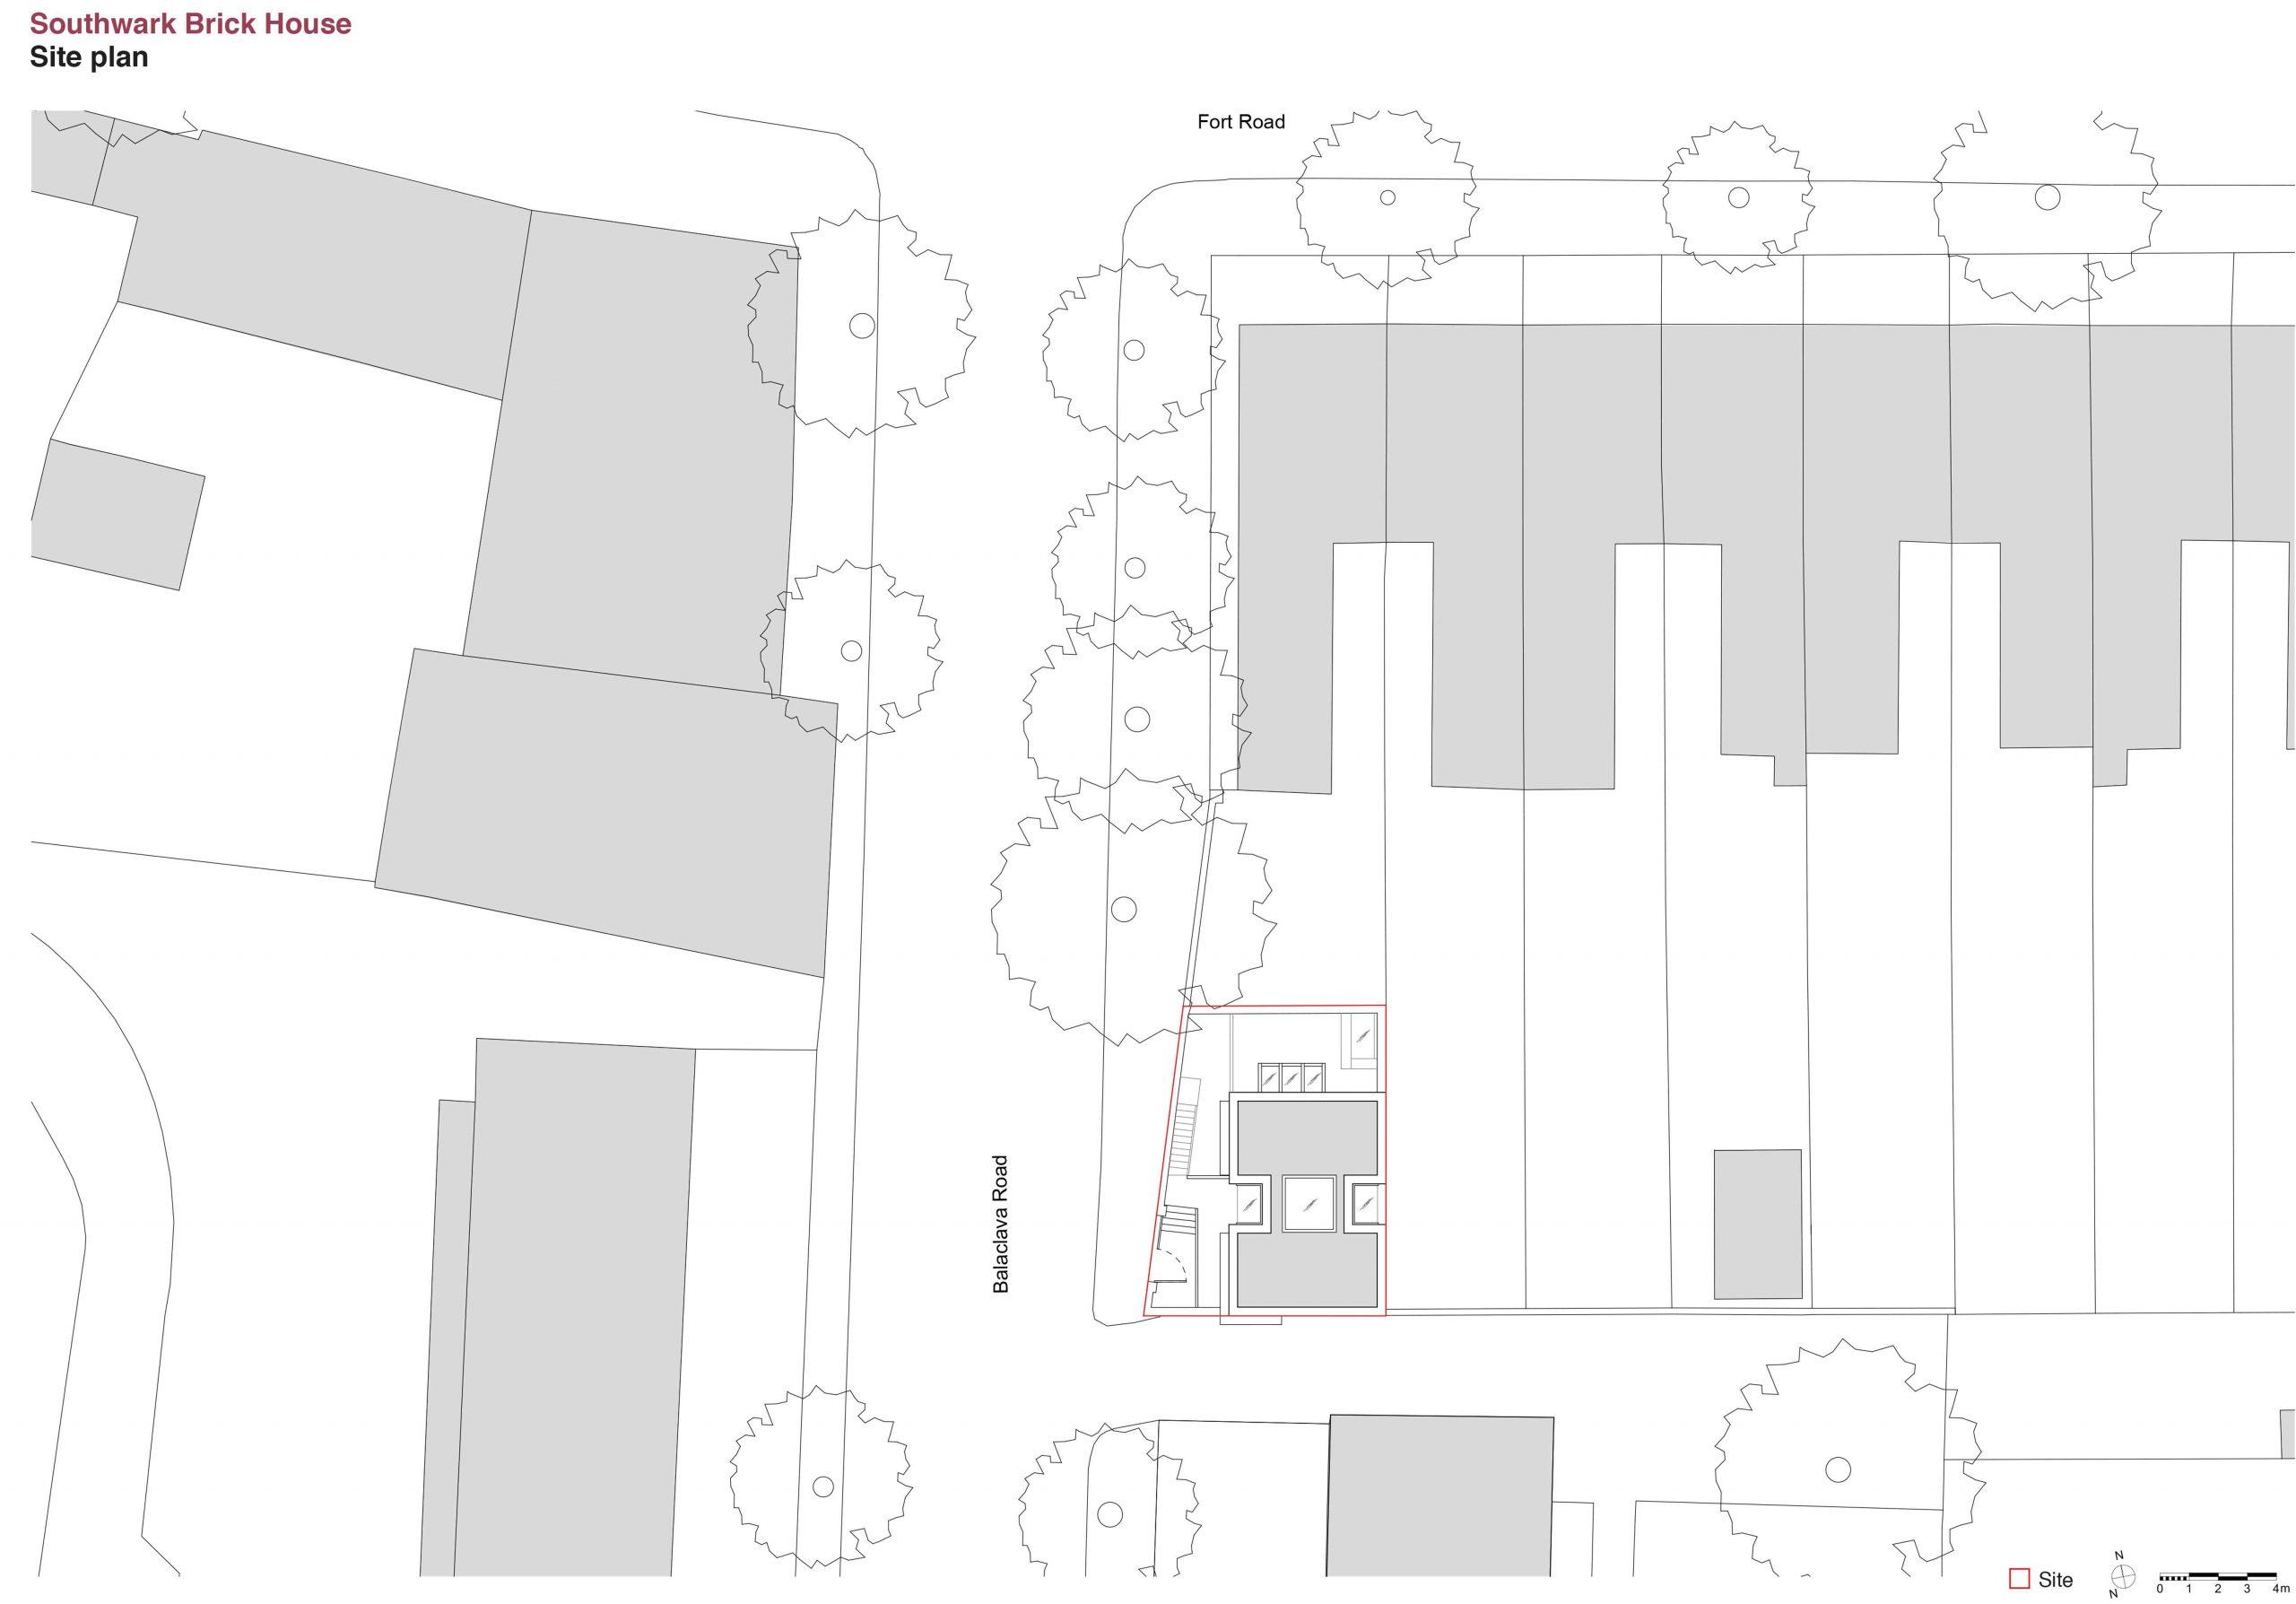 1 Southwark Brick House site plan